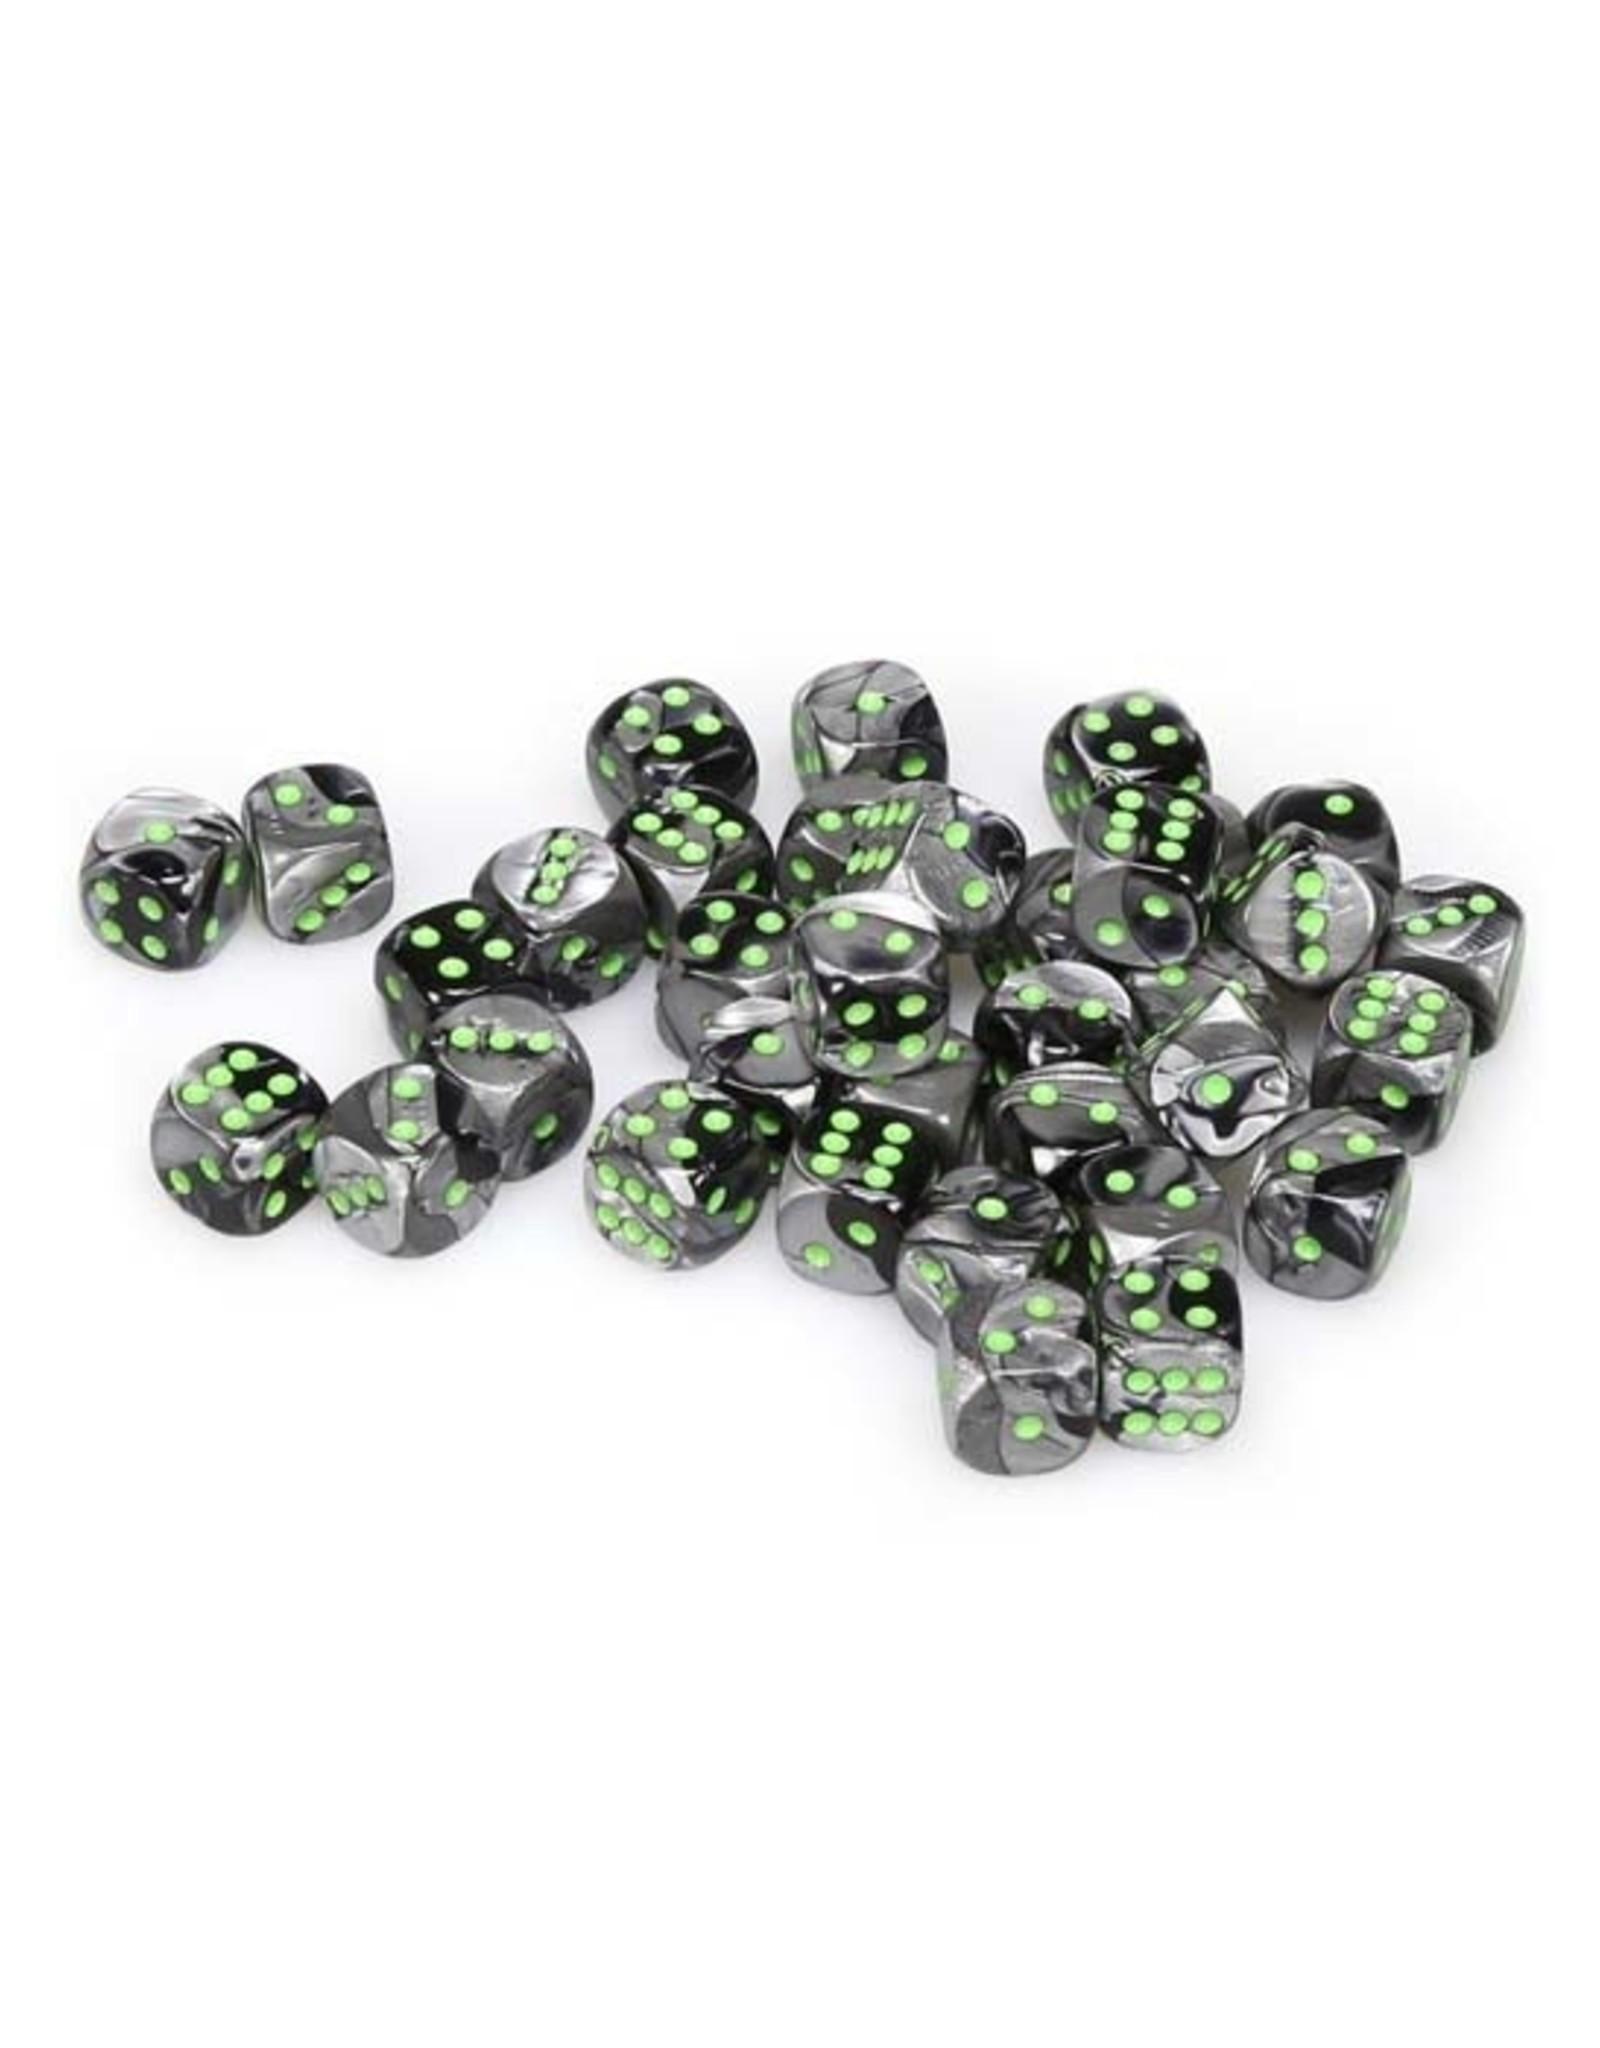 Chessex Chessex: 12mm D6 - Gemini - Black-Grey w/ Green